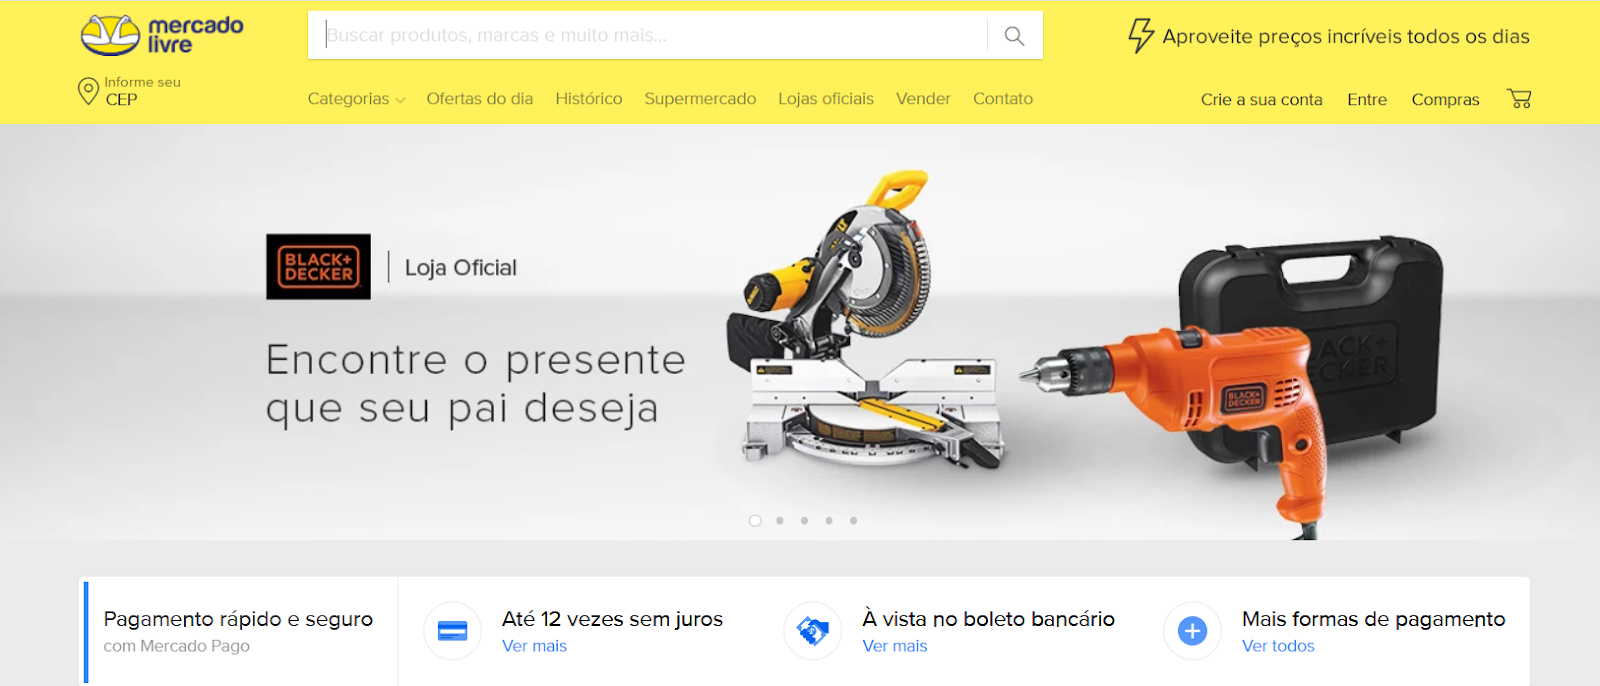 top e-commerce sites in Brazil mercado livre